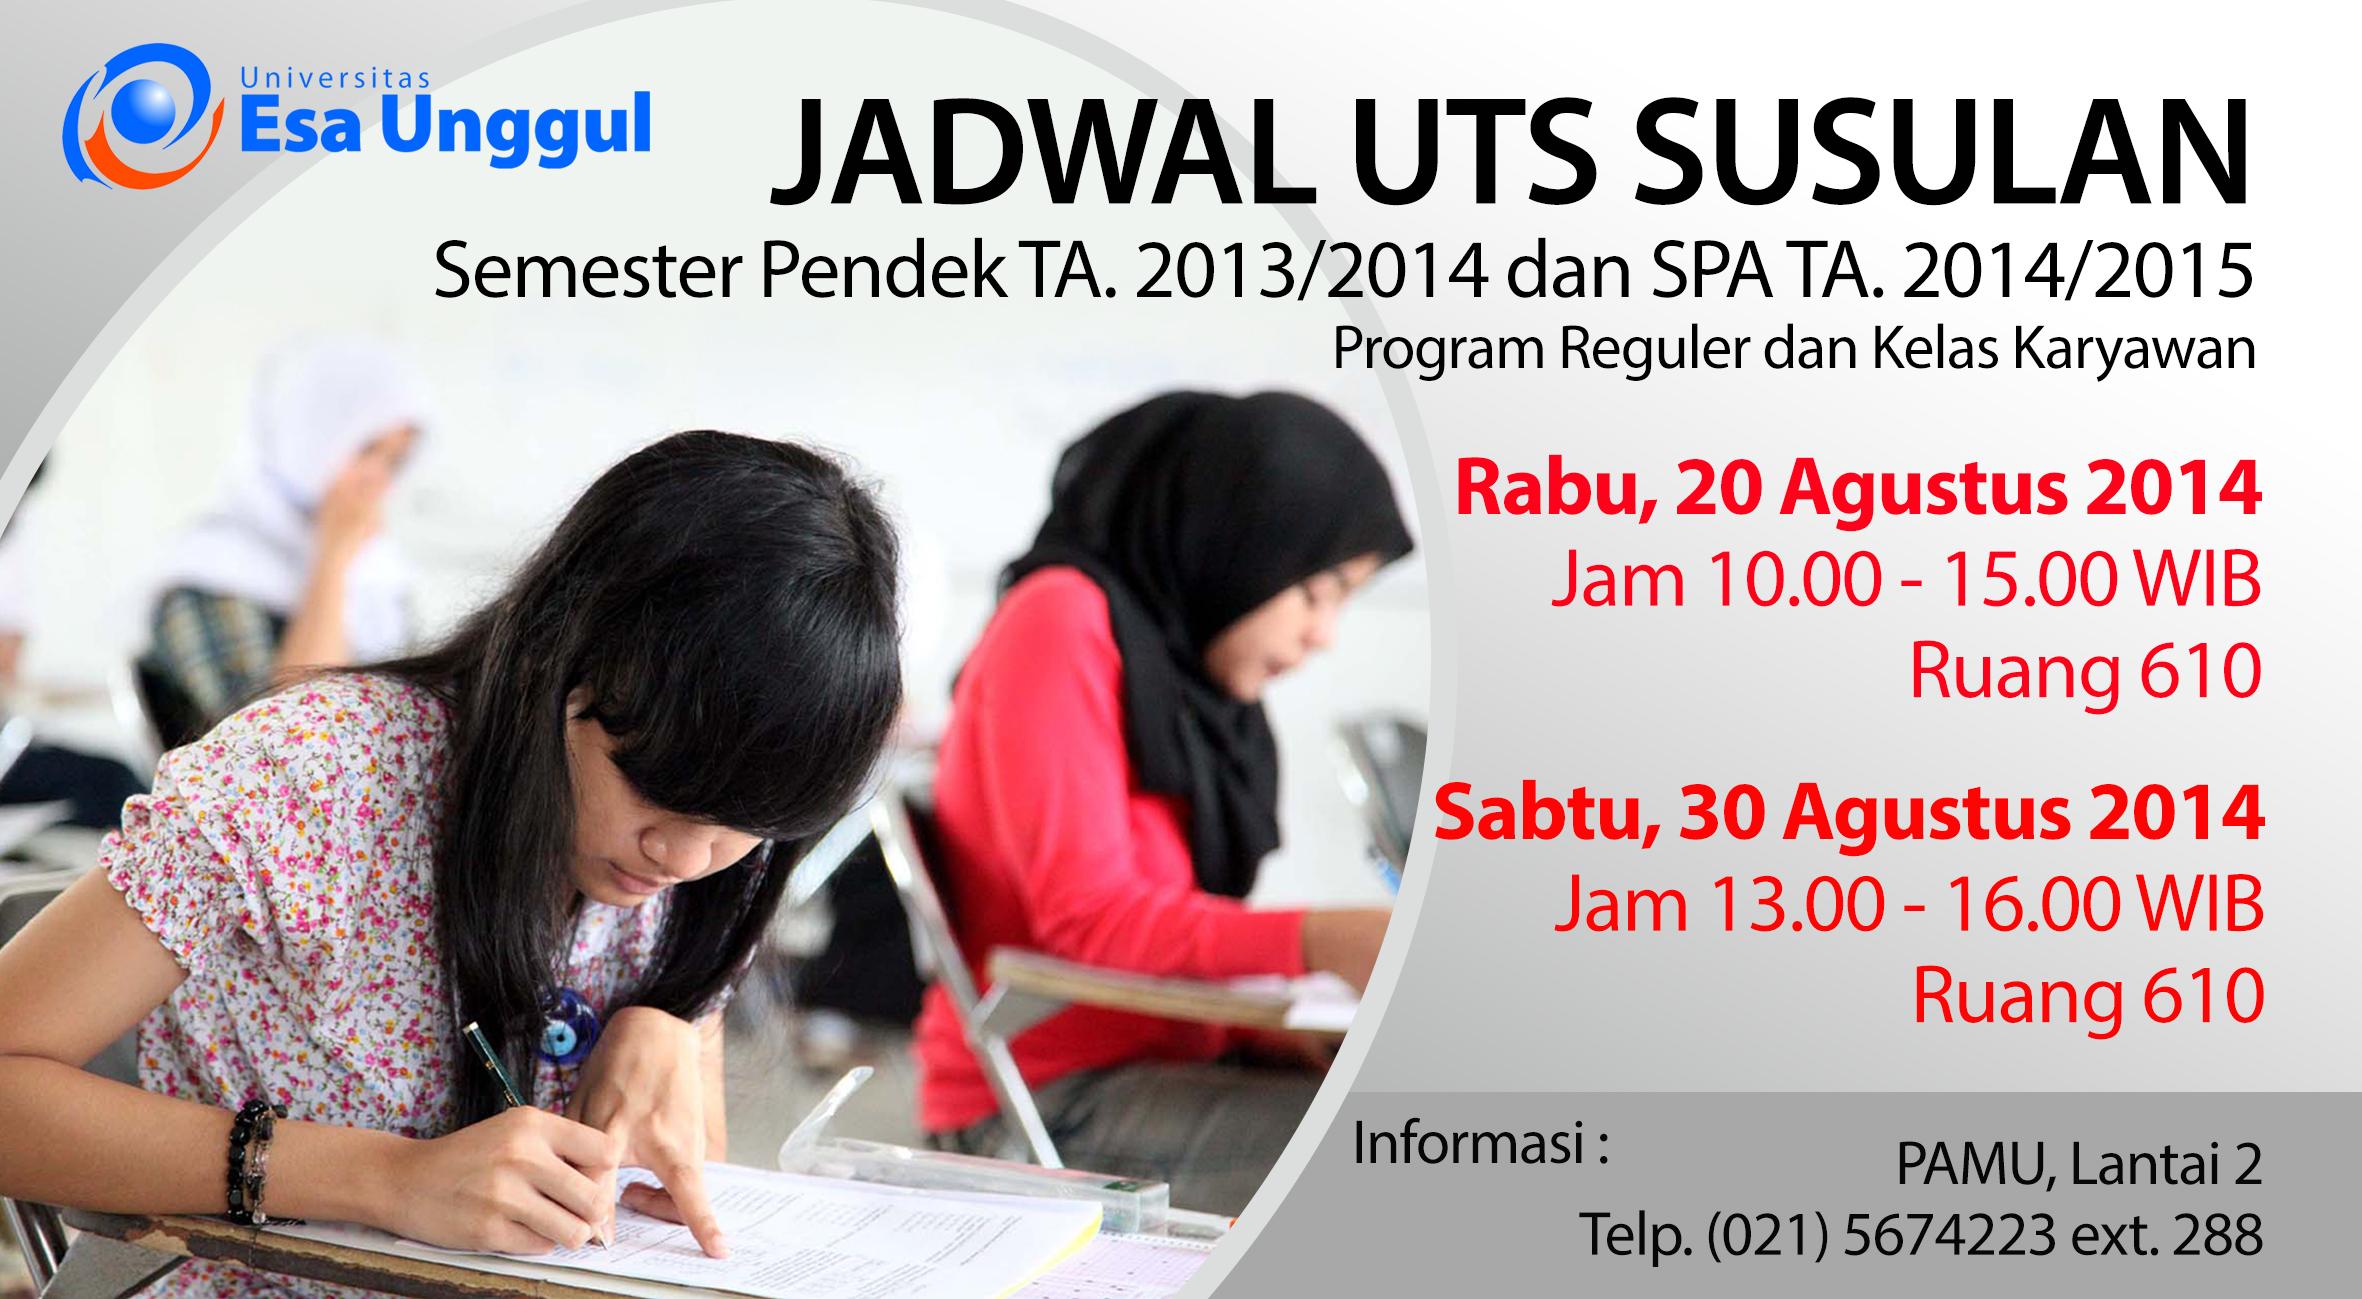 Jadwal dan Tata Cara UTS Susulan Semester Pendek TA.2013/2014 dan SPA TA.2014/2015